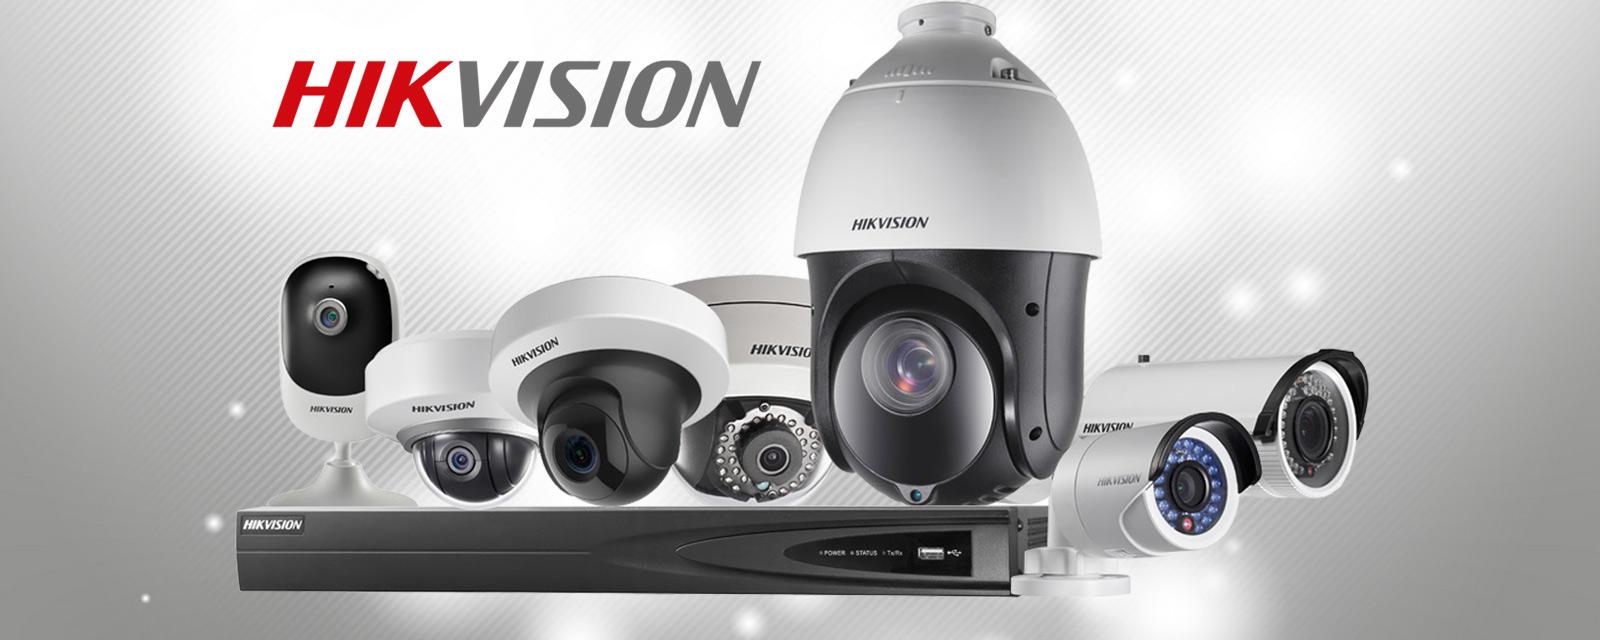 HIKVISION - CFTV